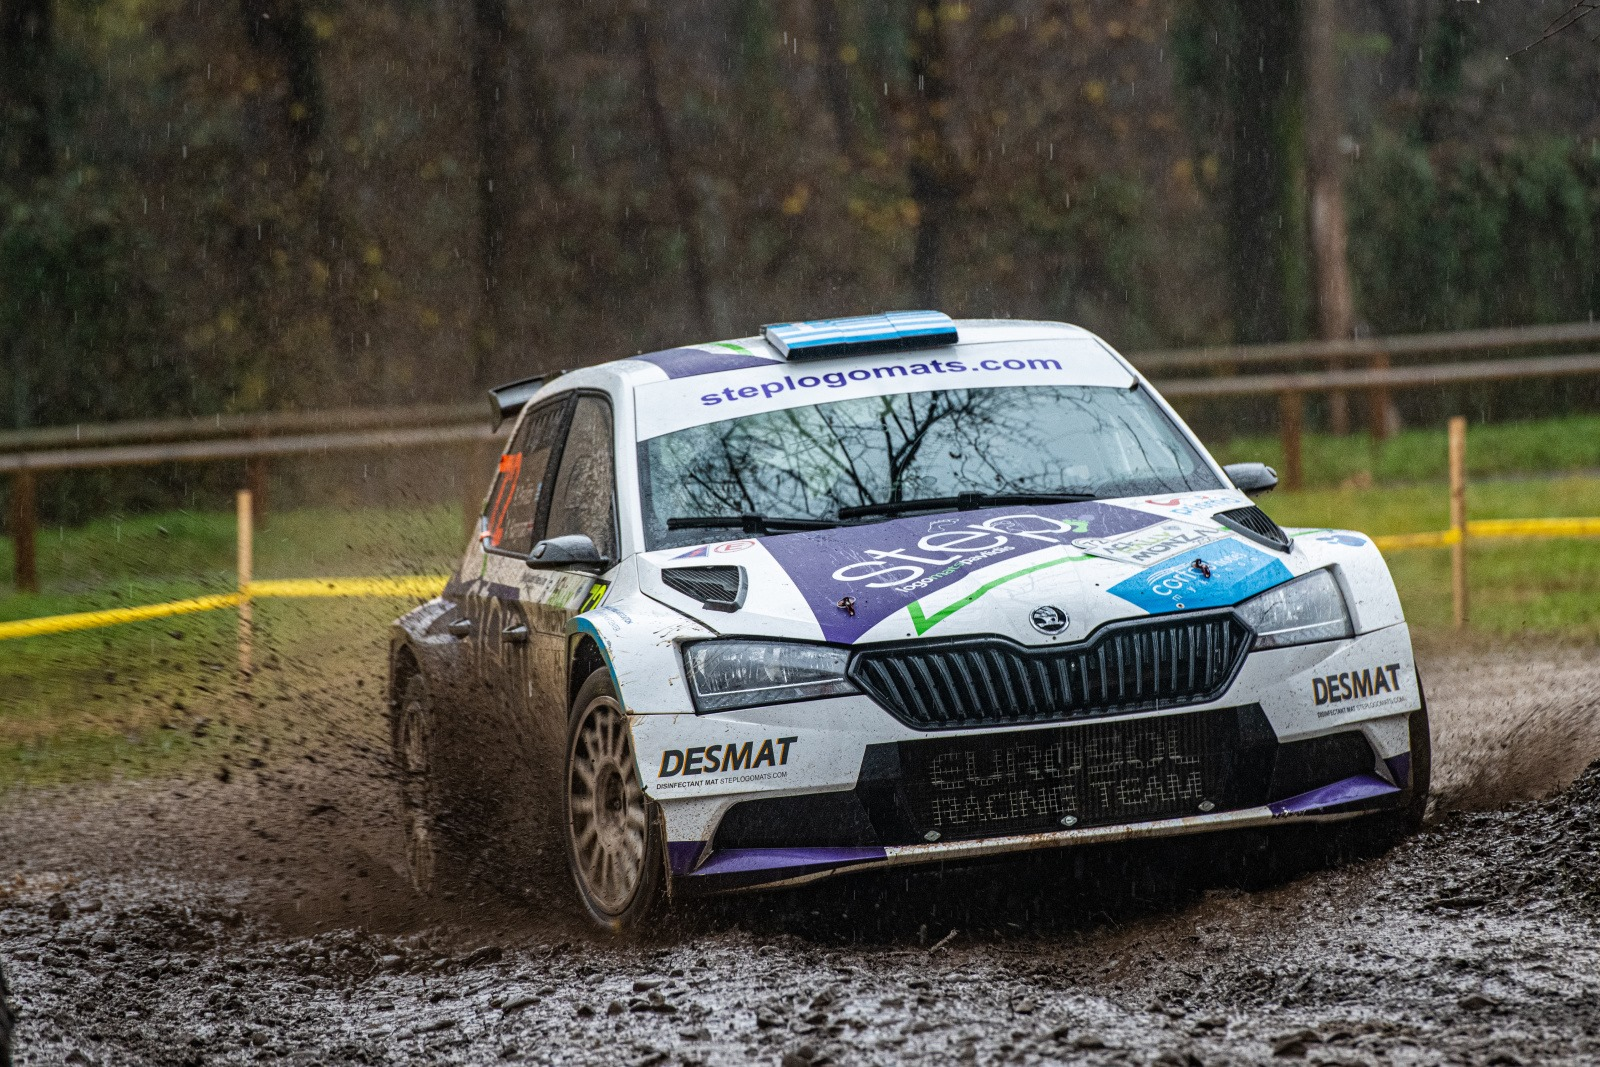 Step Racing- ACI Rally Monza- leg 1- Σε πρωτόγνωρες συνθήκες!